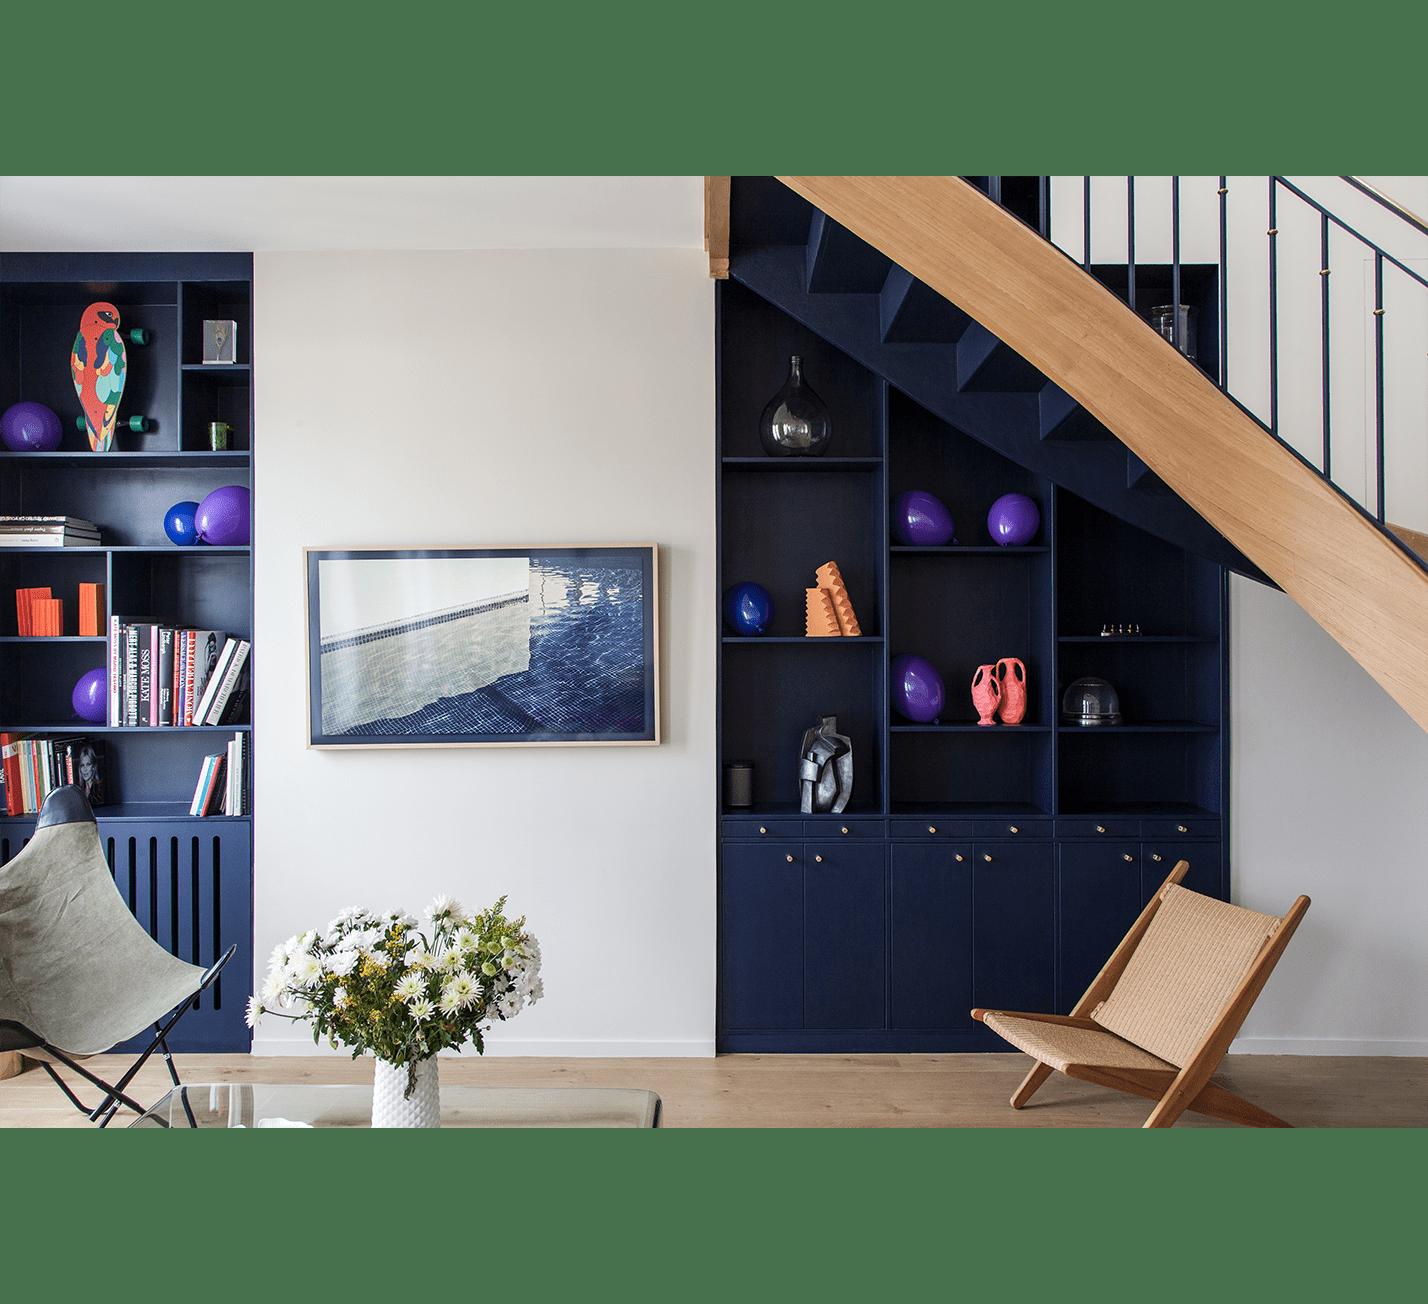 Projet-Arlequin-Atelier-Steve-Pauline-Borgia-Architecture-interieur-02-min